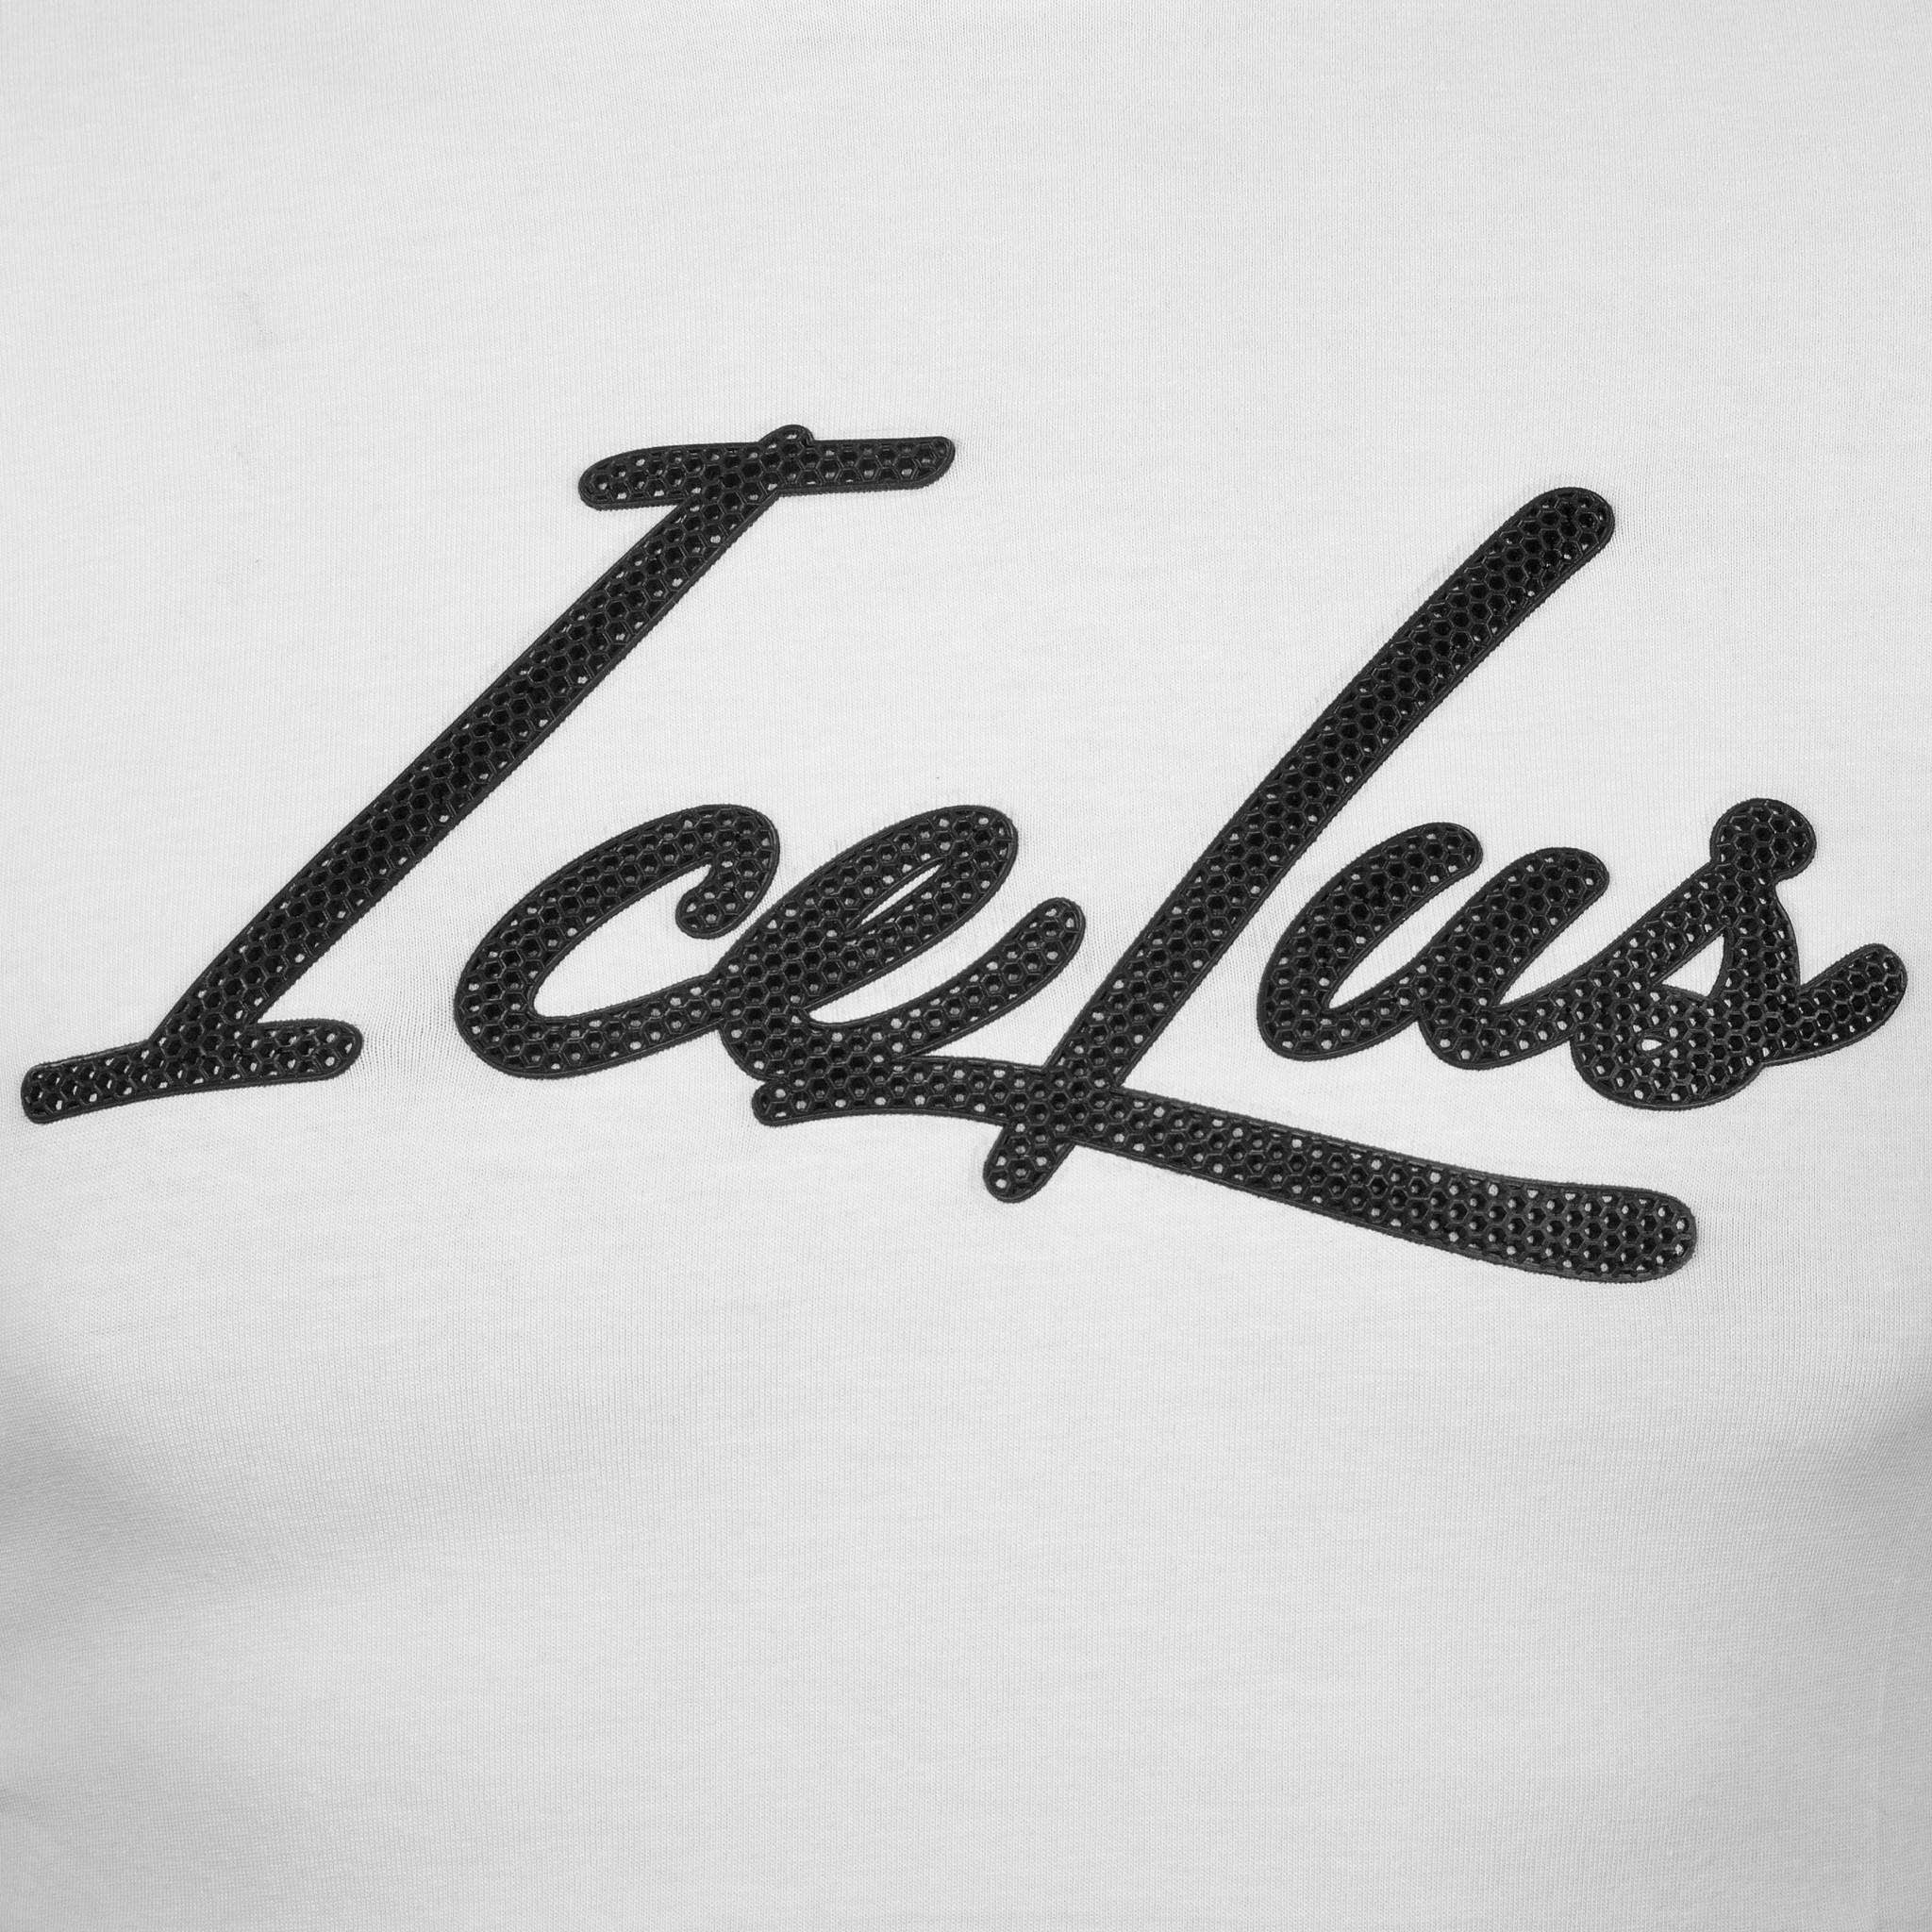 Icelus Clothing Icelus 3D Black White